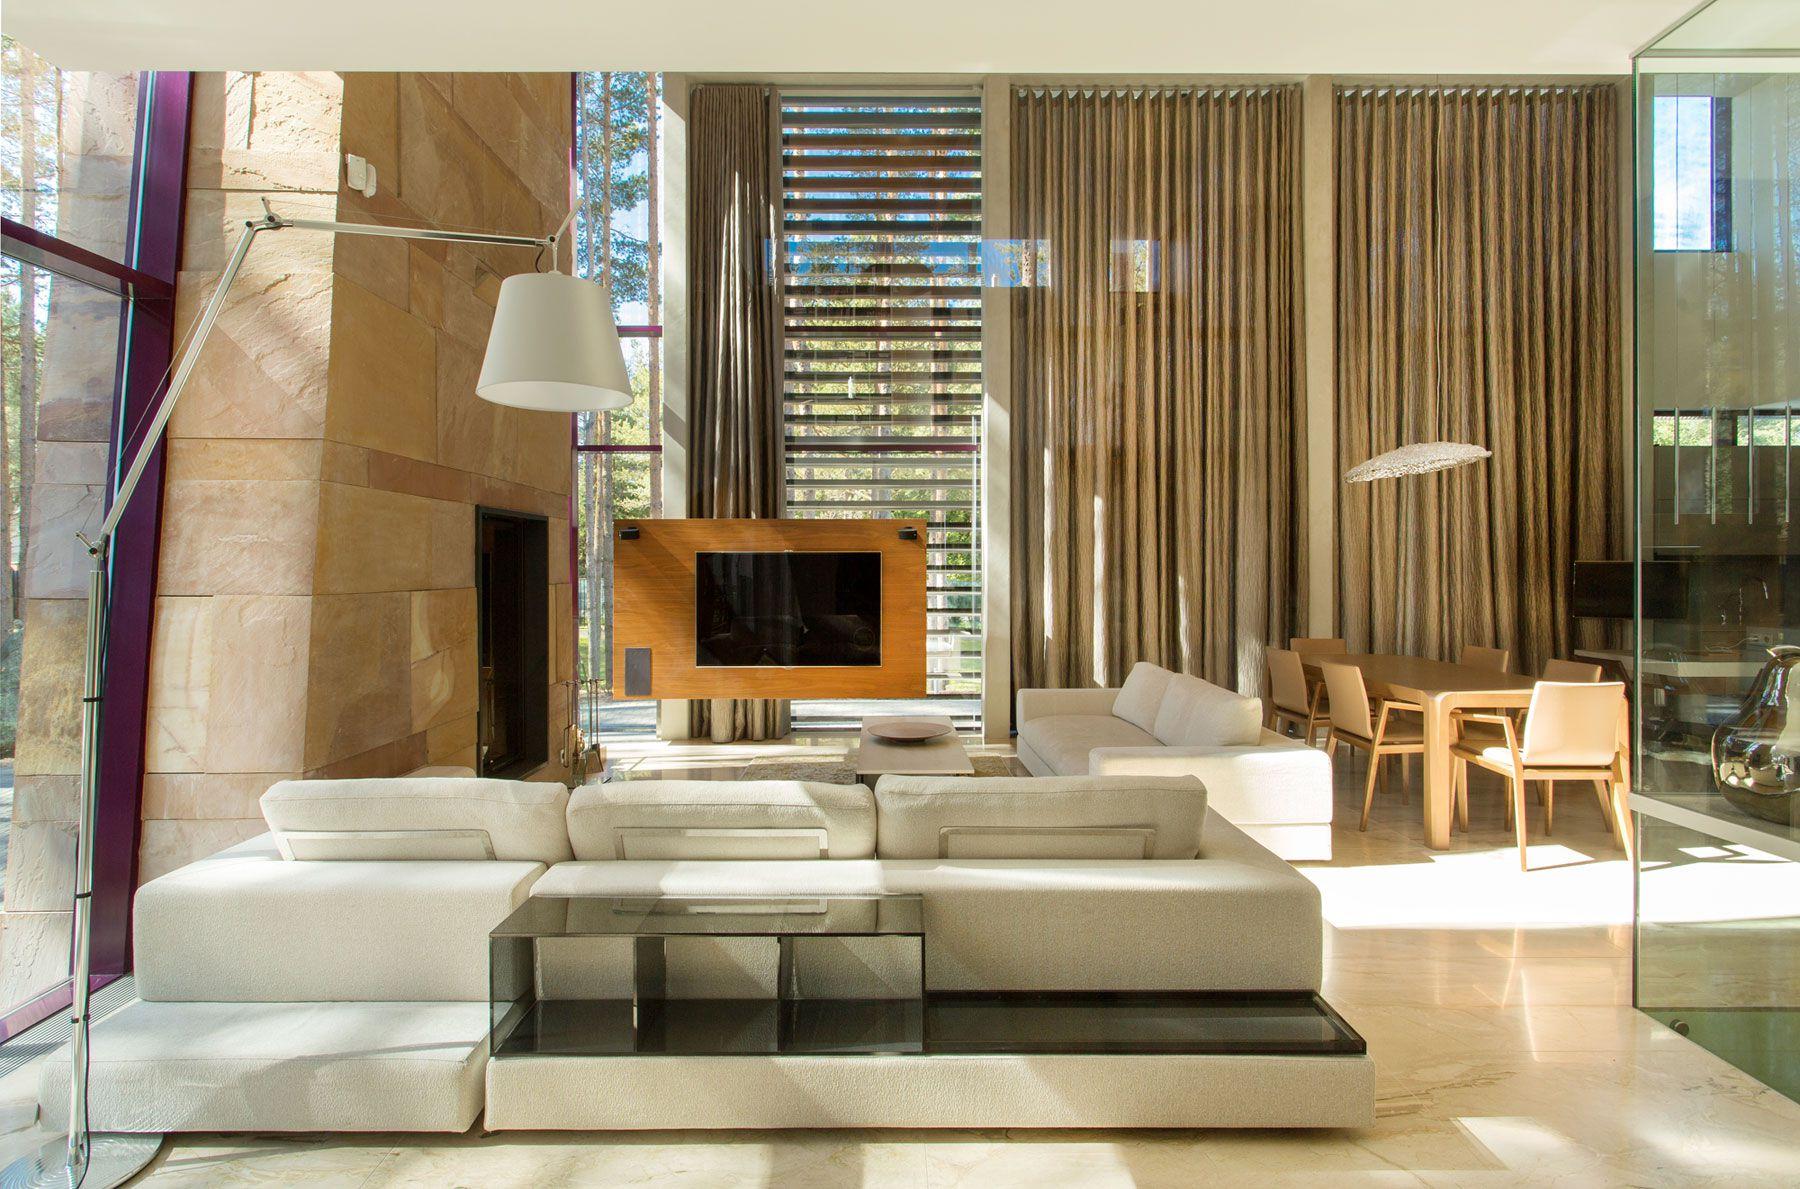 Ultramodern Villa Estebania Near the Forrest by Arch-D-01